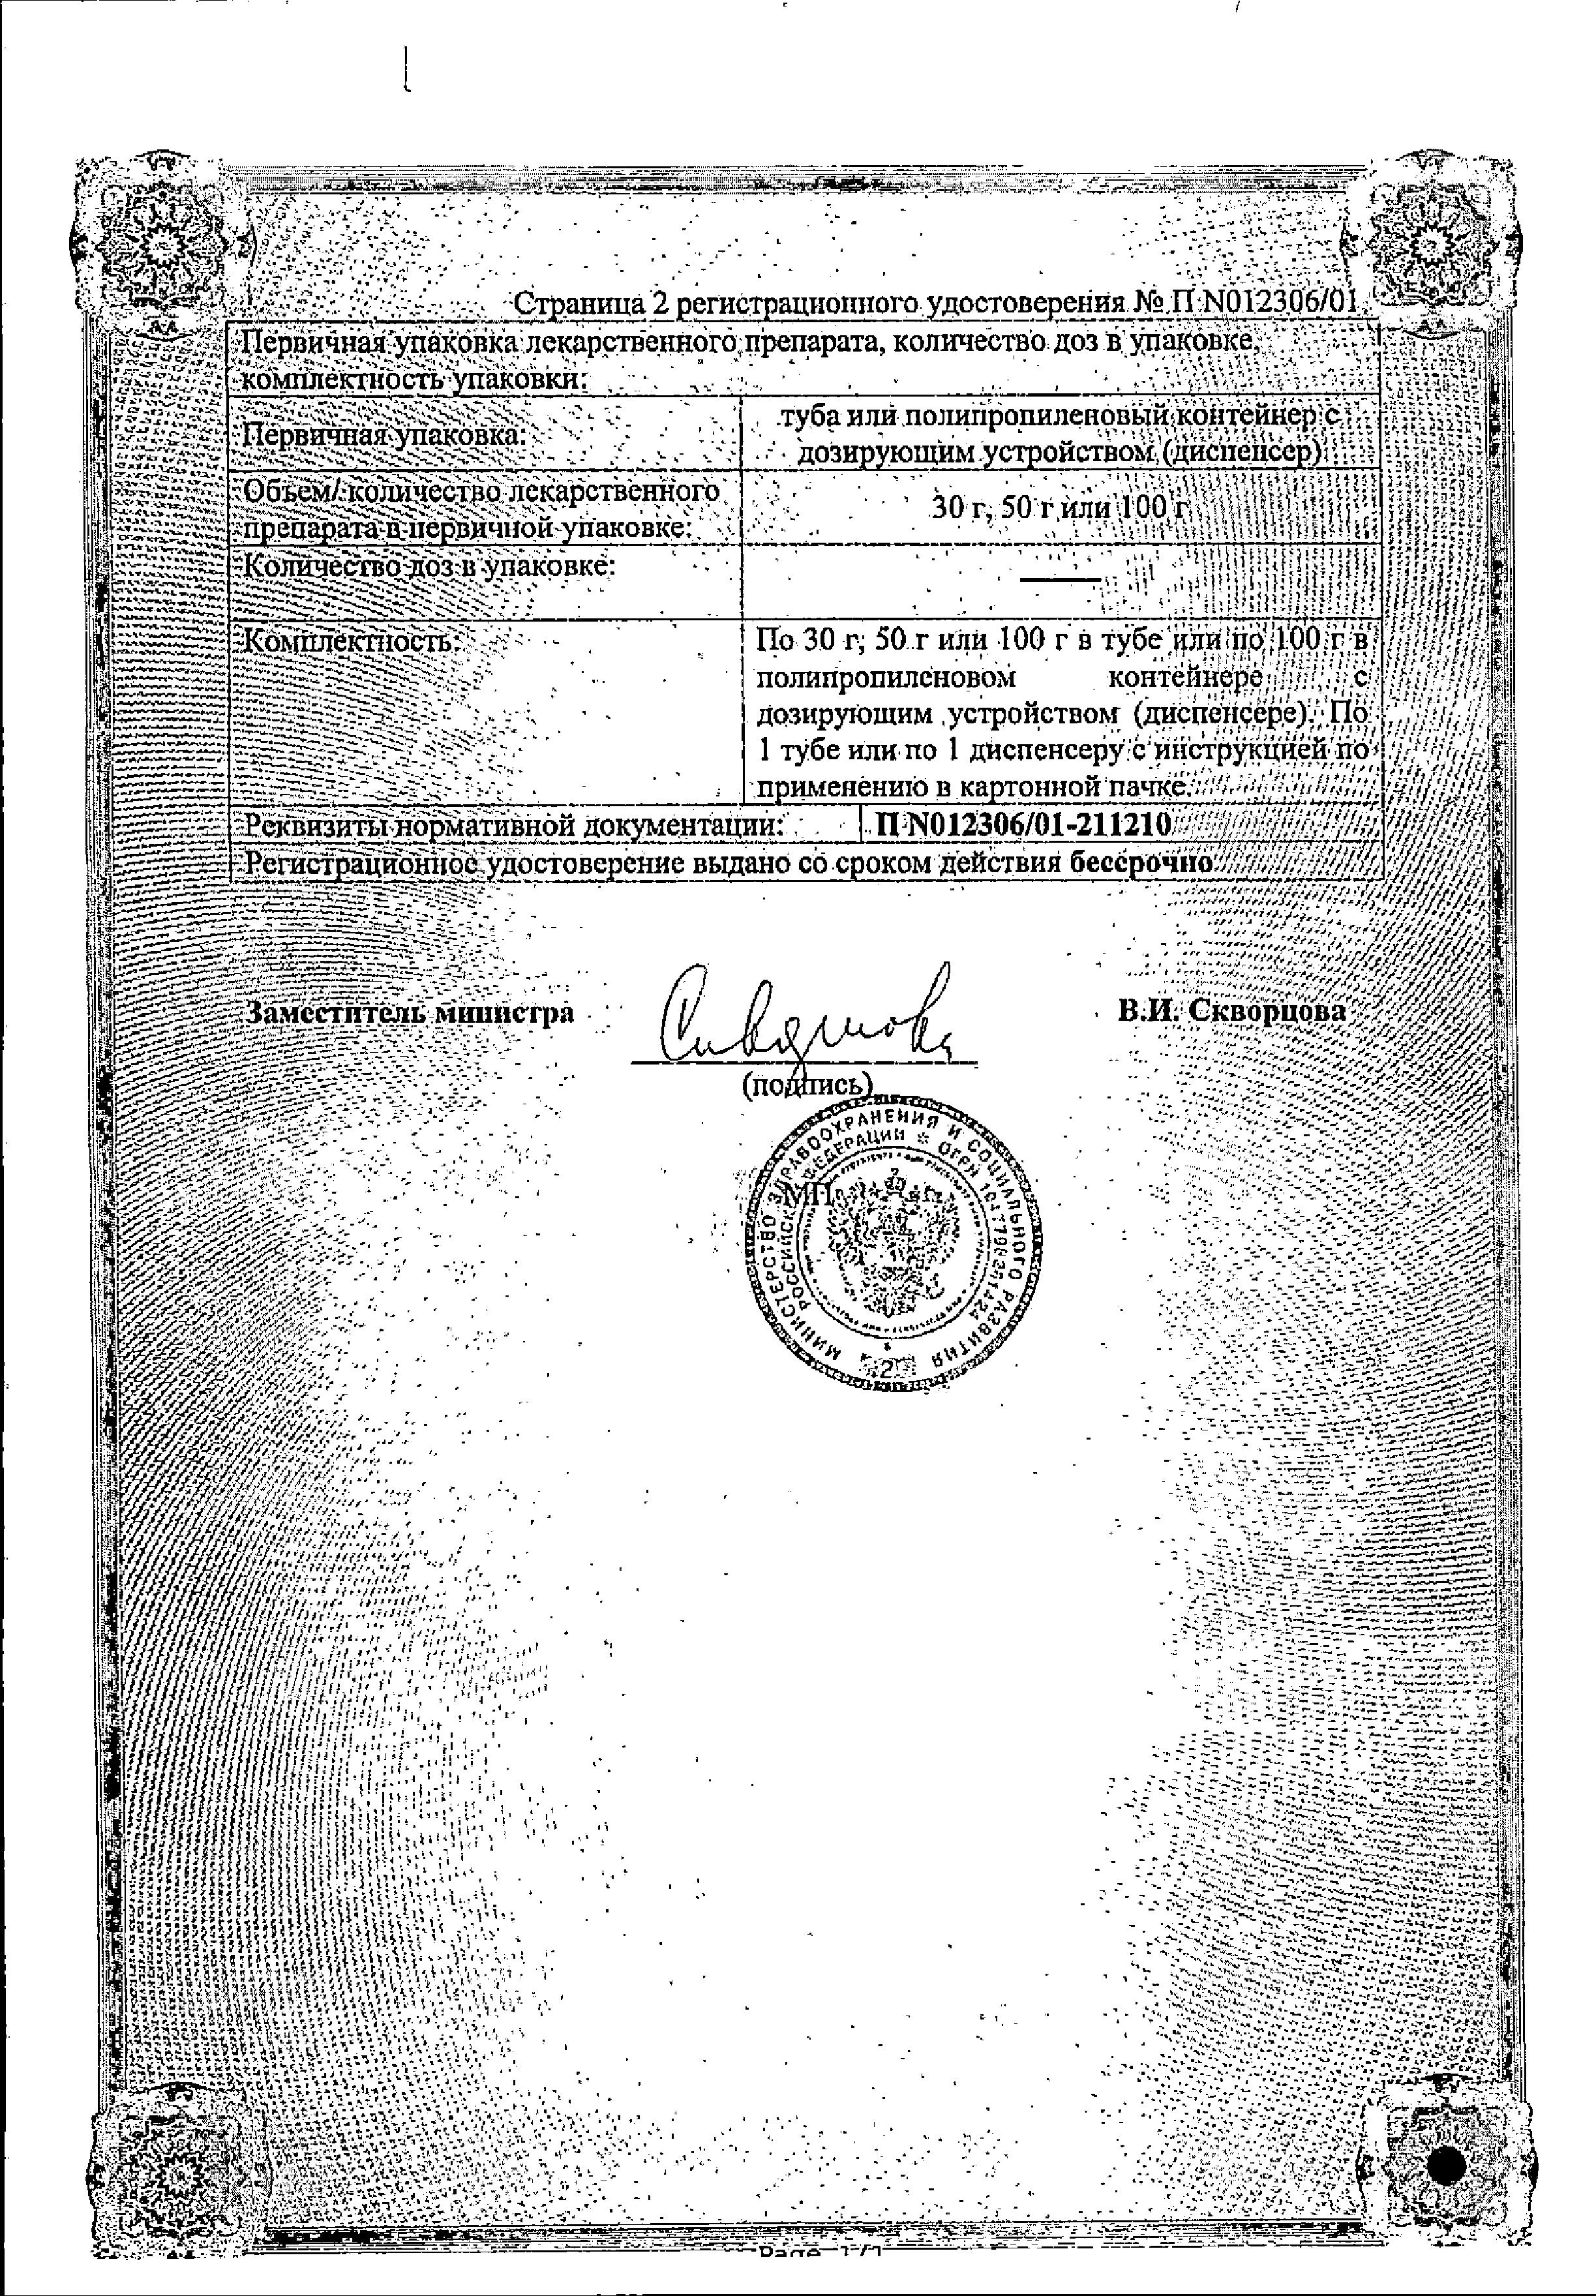 Фастум сертификат